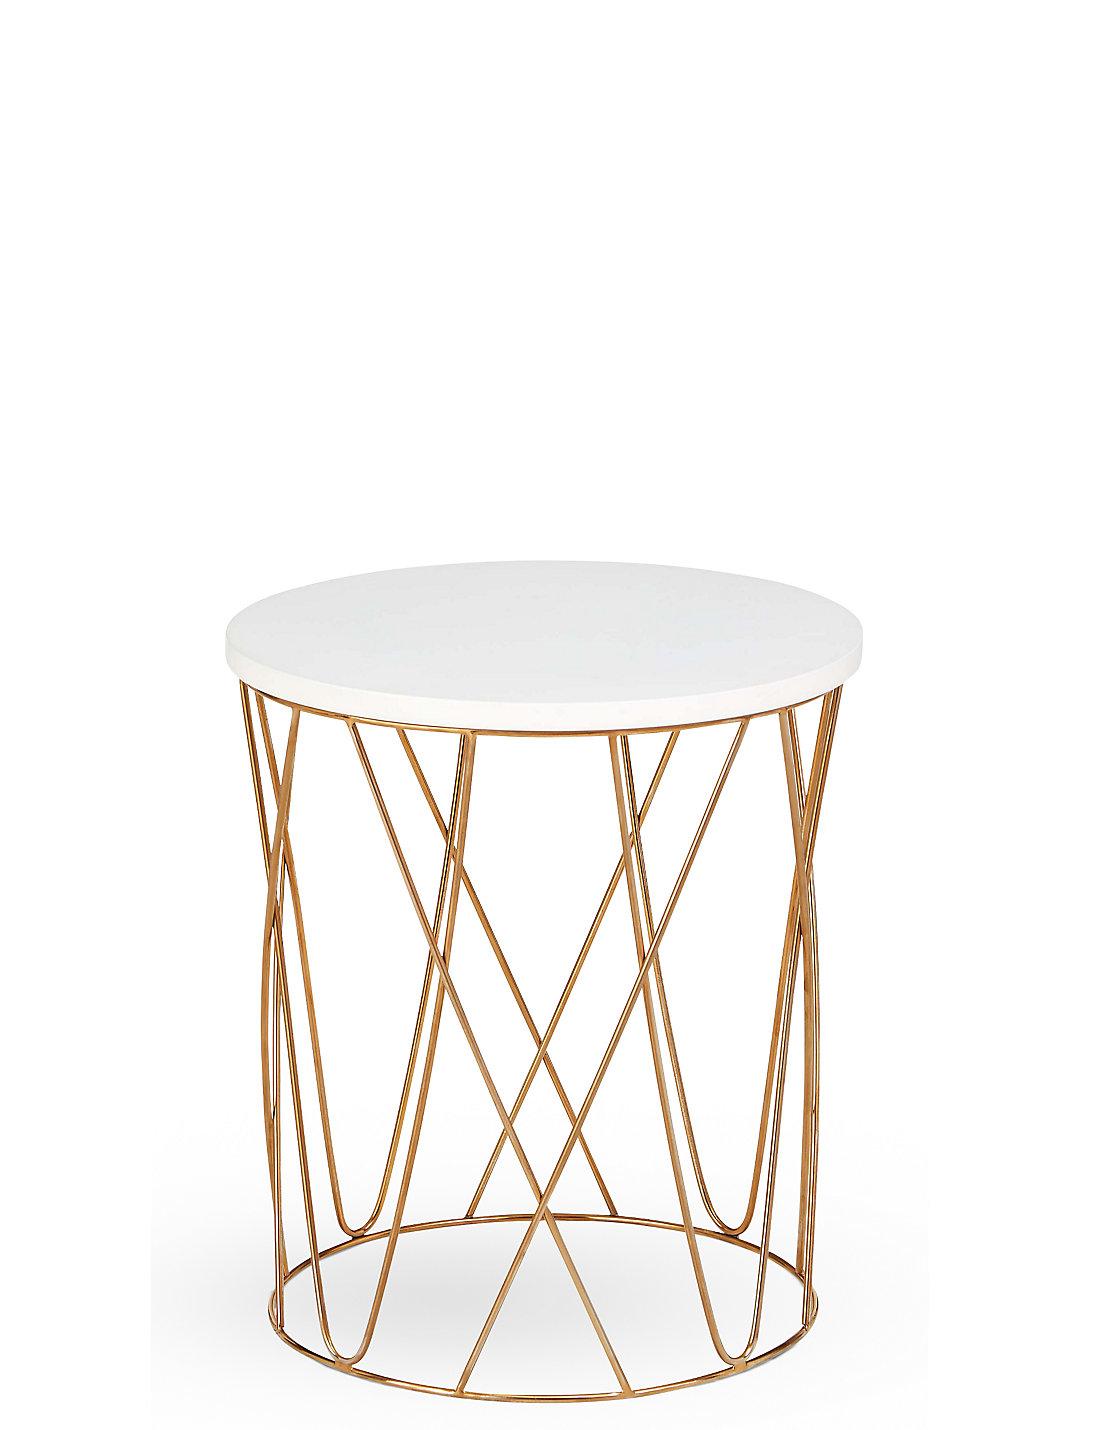 Lena copper side table ms lena copper side table greentooth Choice Image